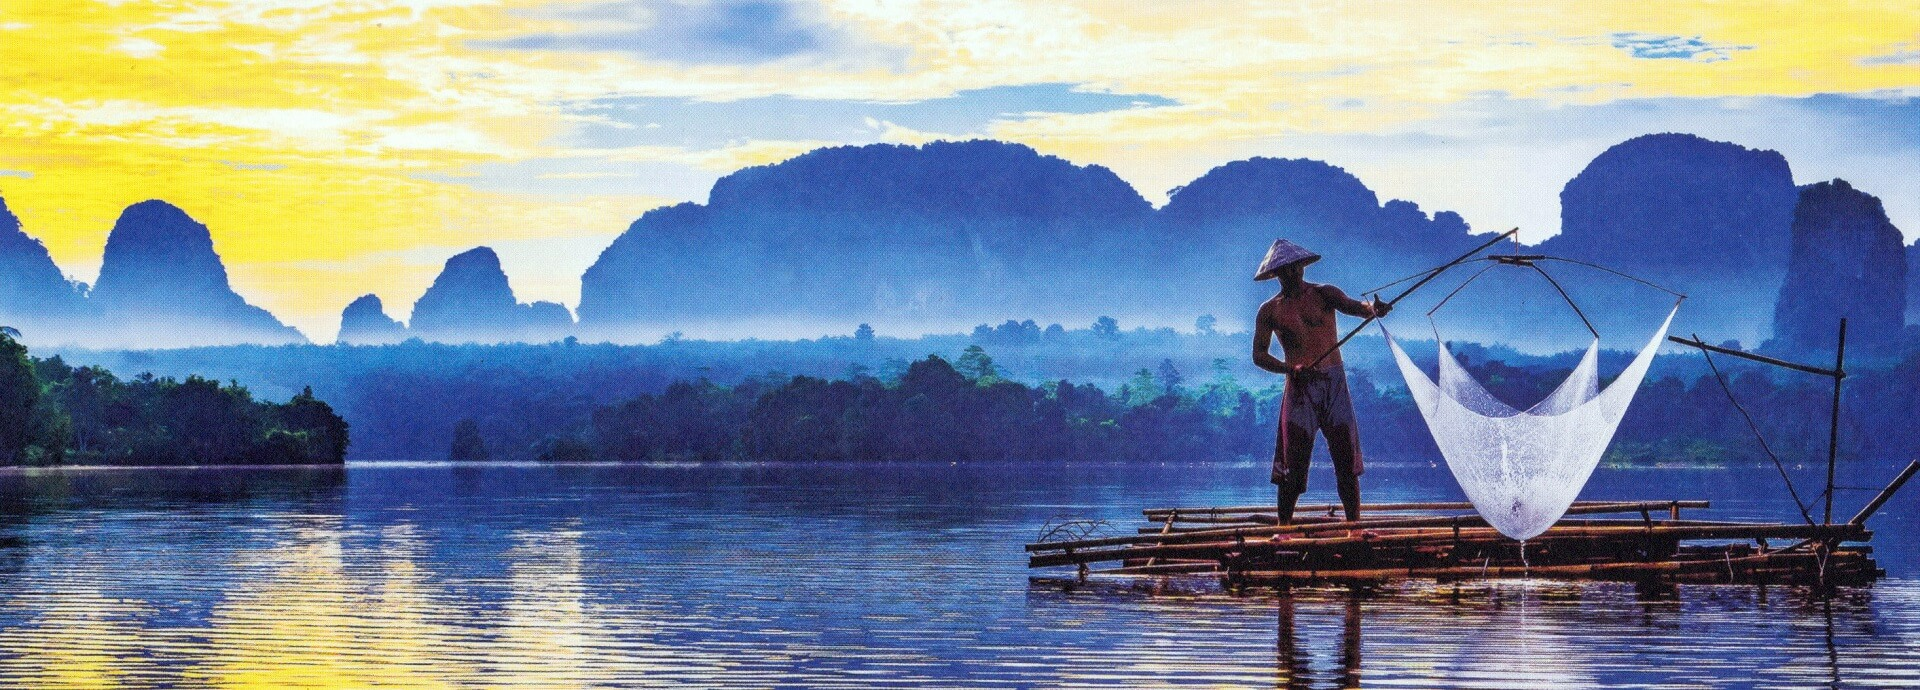 Nong Thale